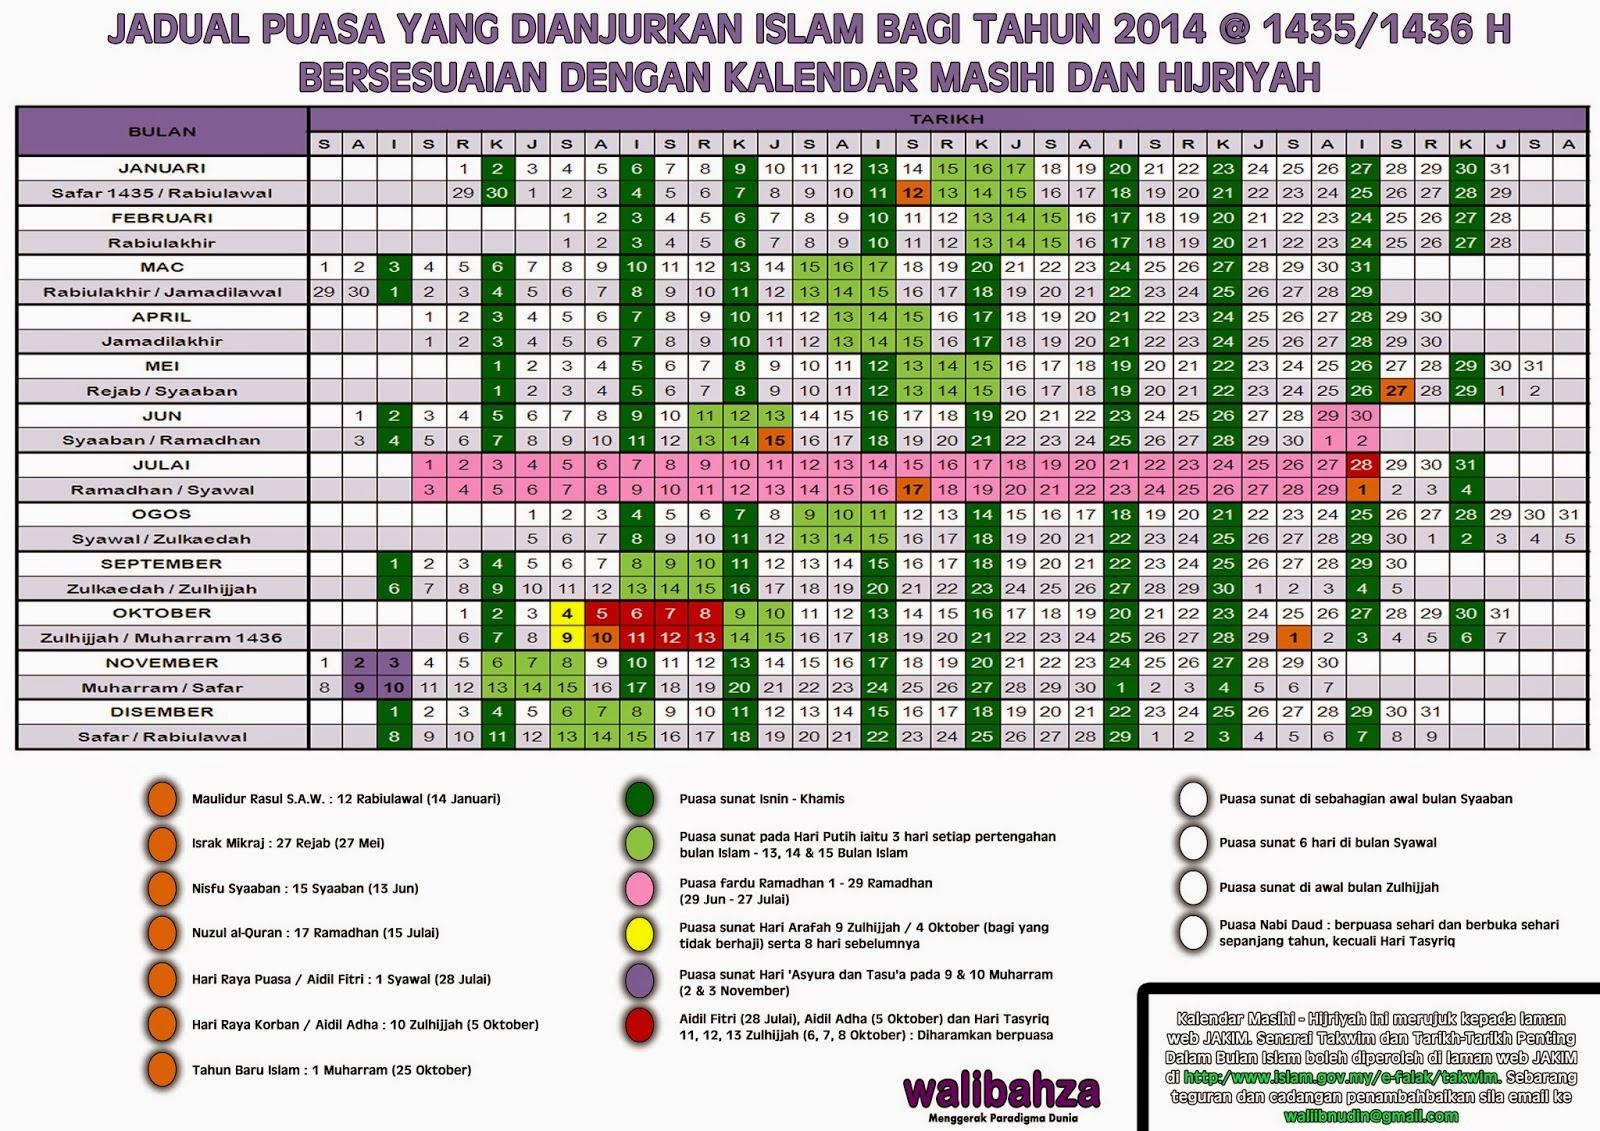 Jadual Takwim Puasa Wajib dan Sunat Tahun 2014